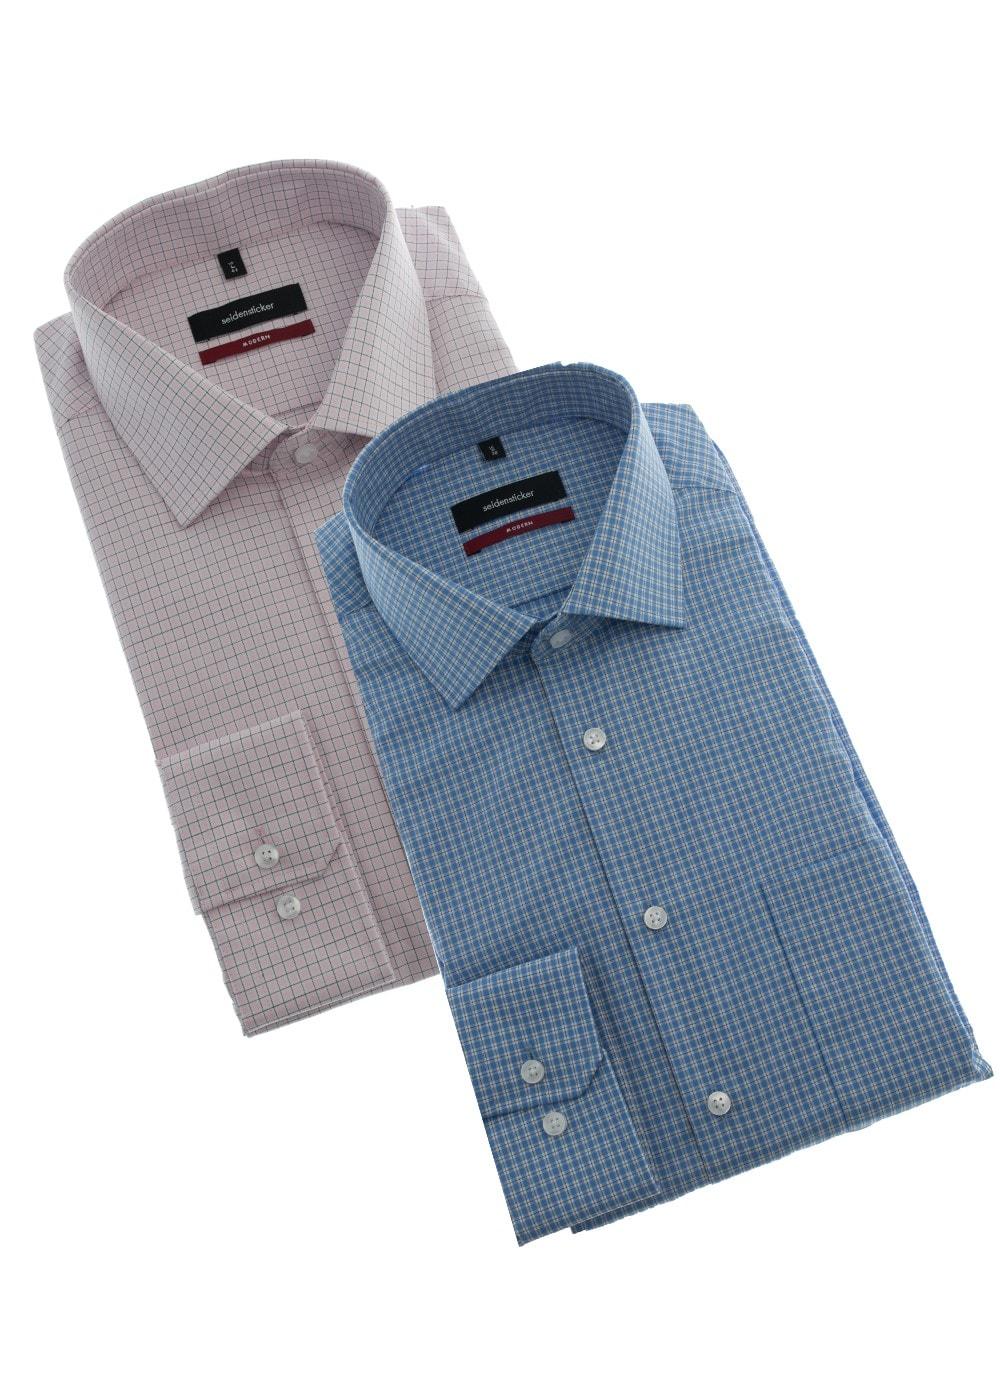 Seidensticker Classic Pure Cotton Shirt - Mens from A Hume UK df2e90b339426